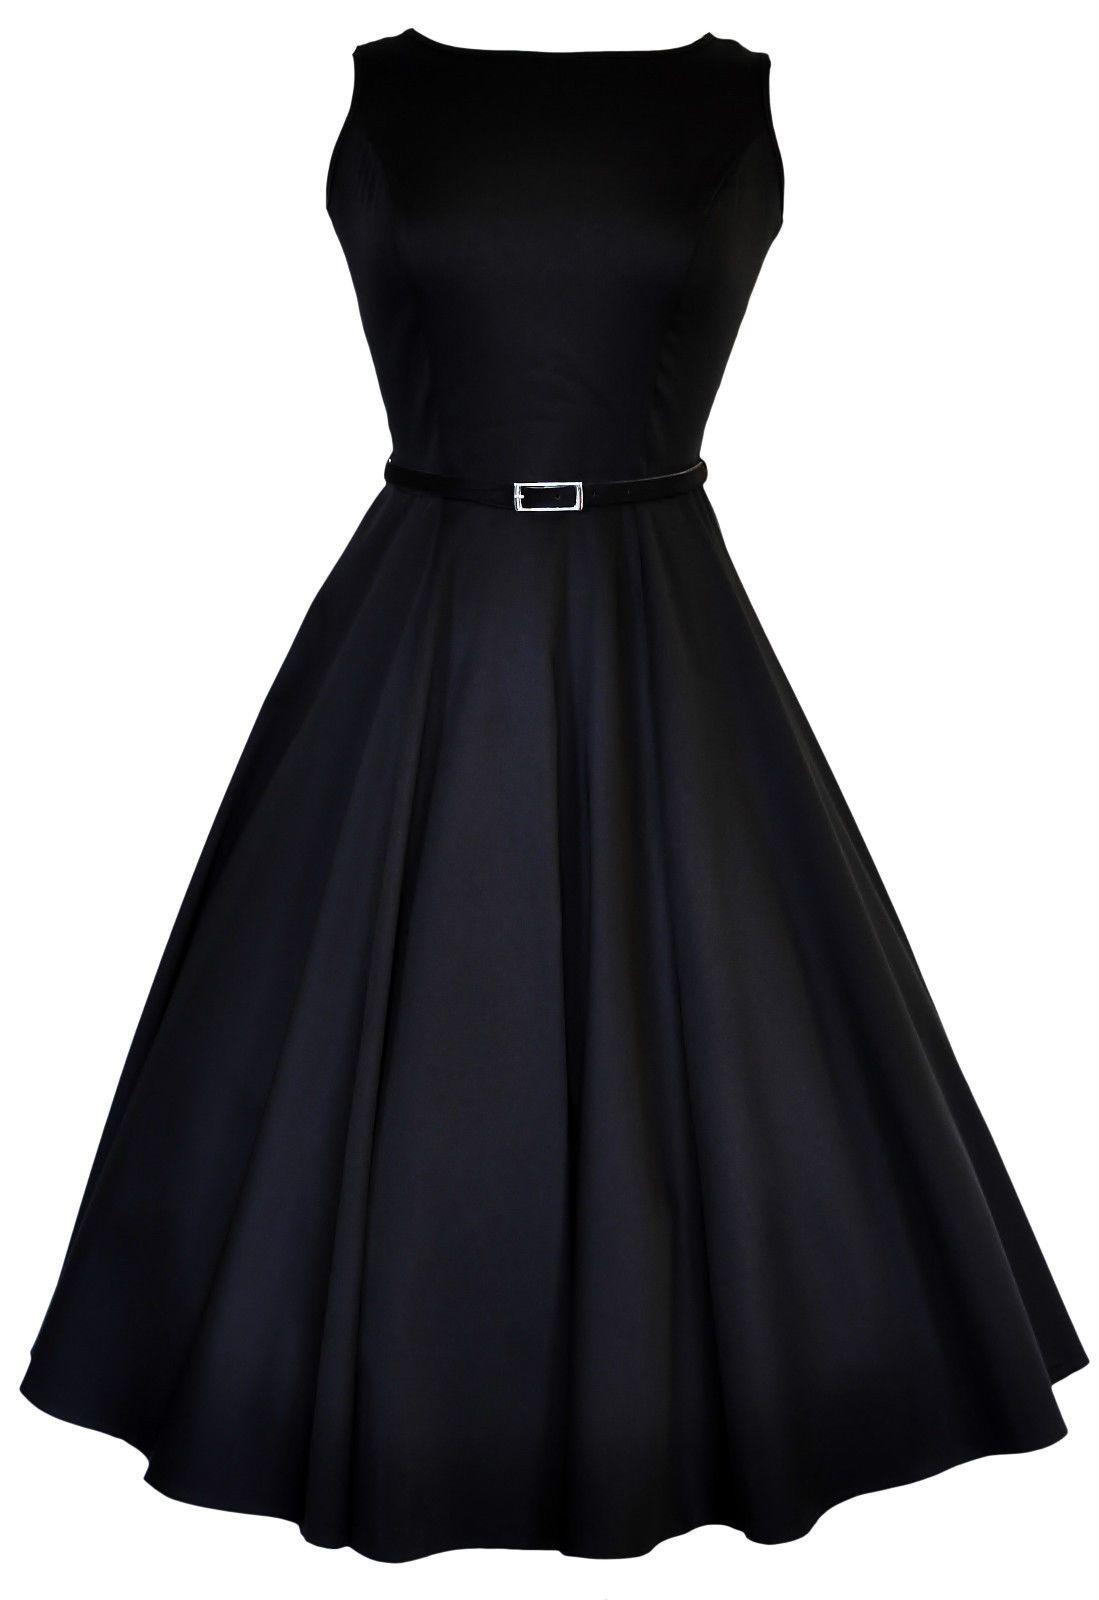 The Audrey Hepburn Dress : Classic Black